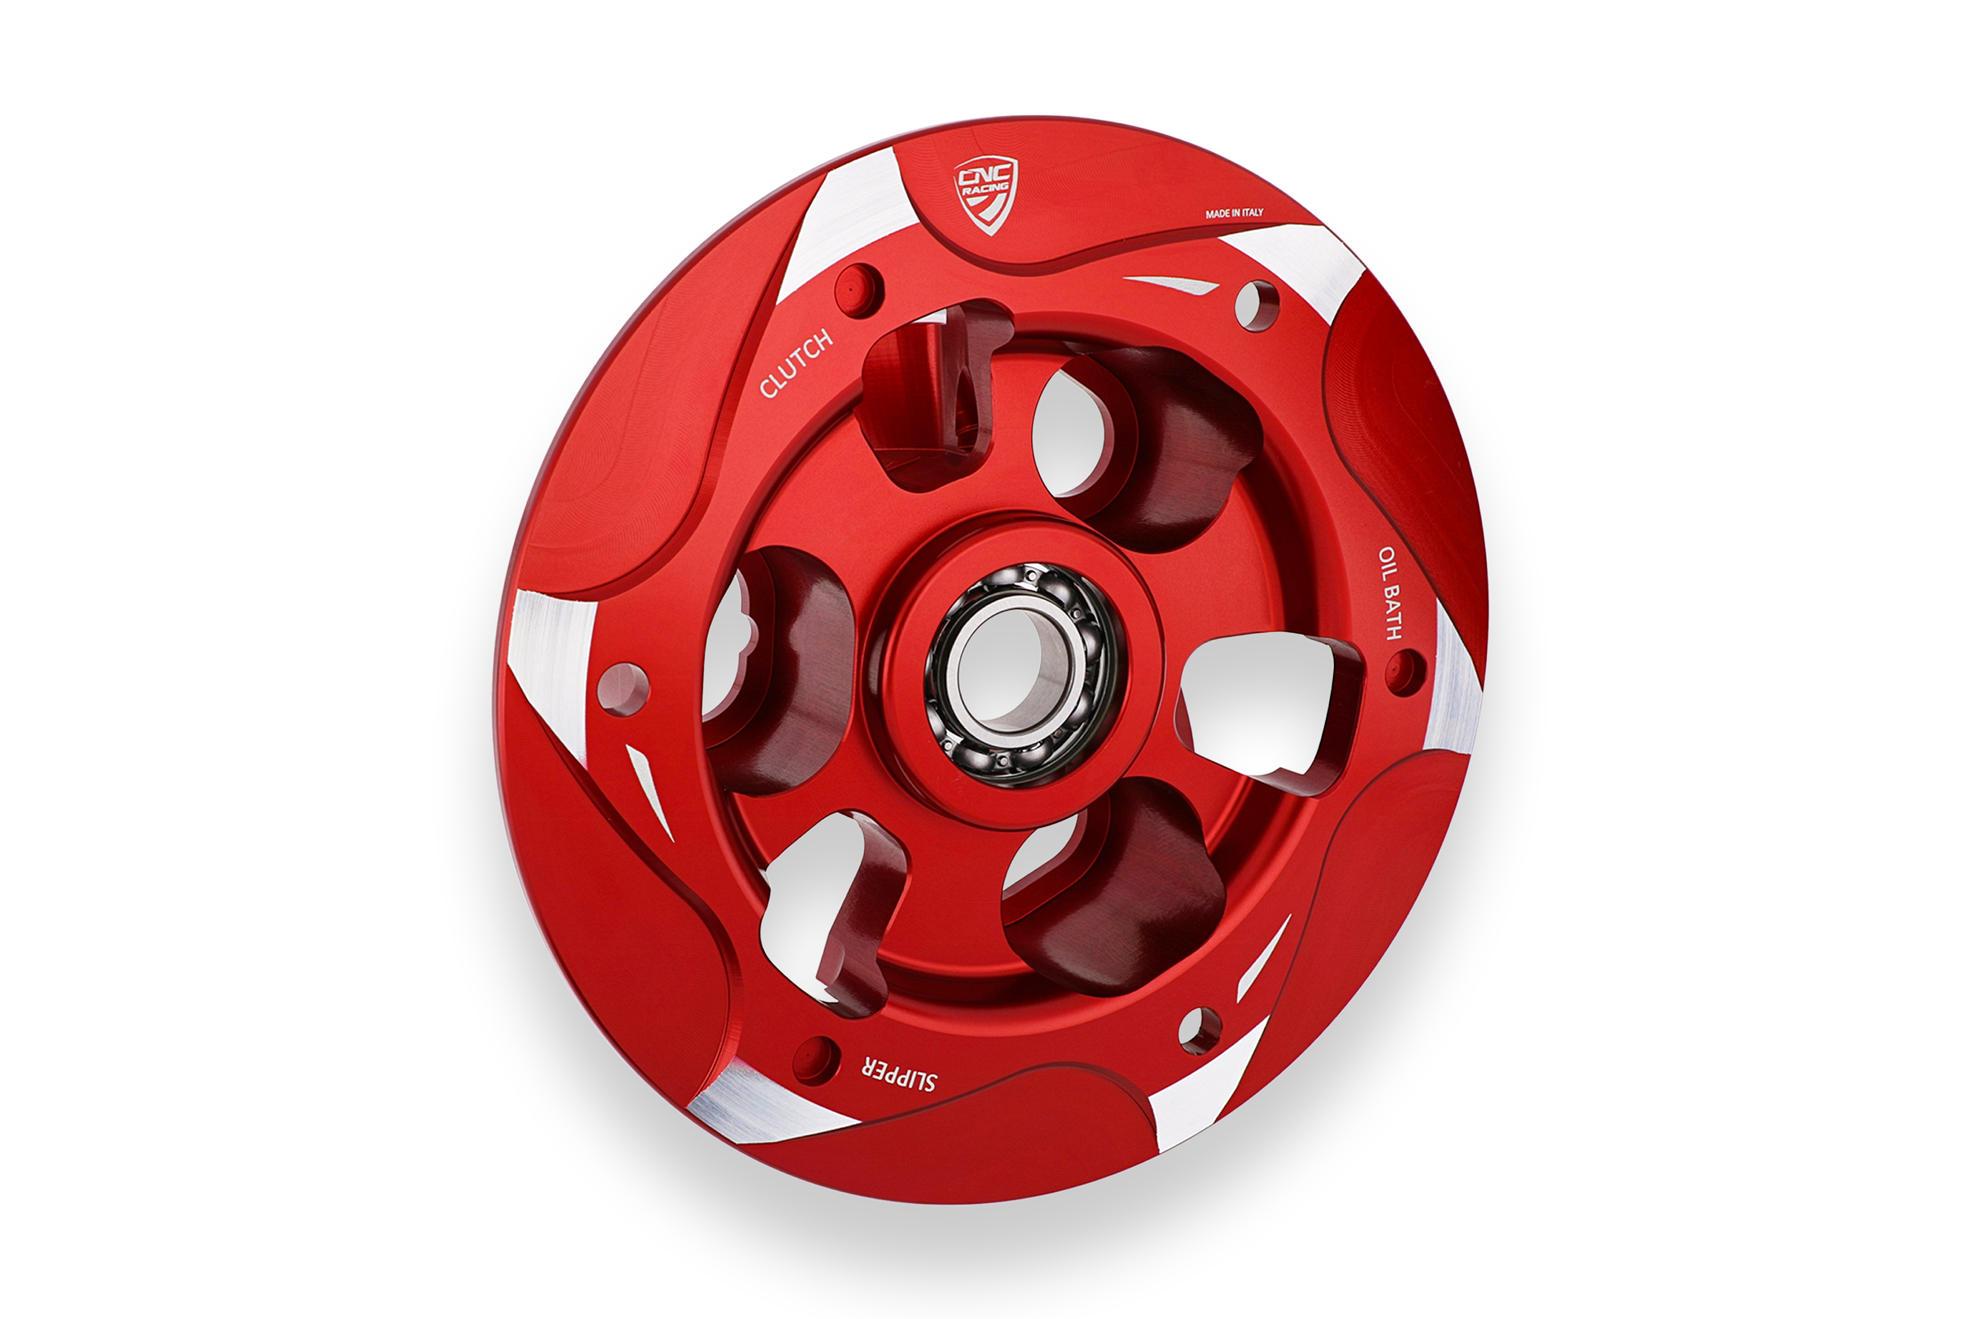 Pressure plate CNC Racing สำหรับ M821 2017+